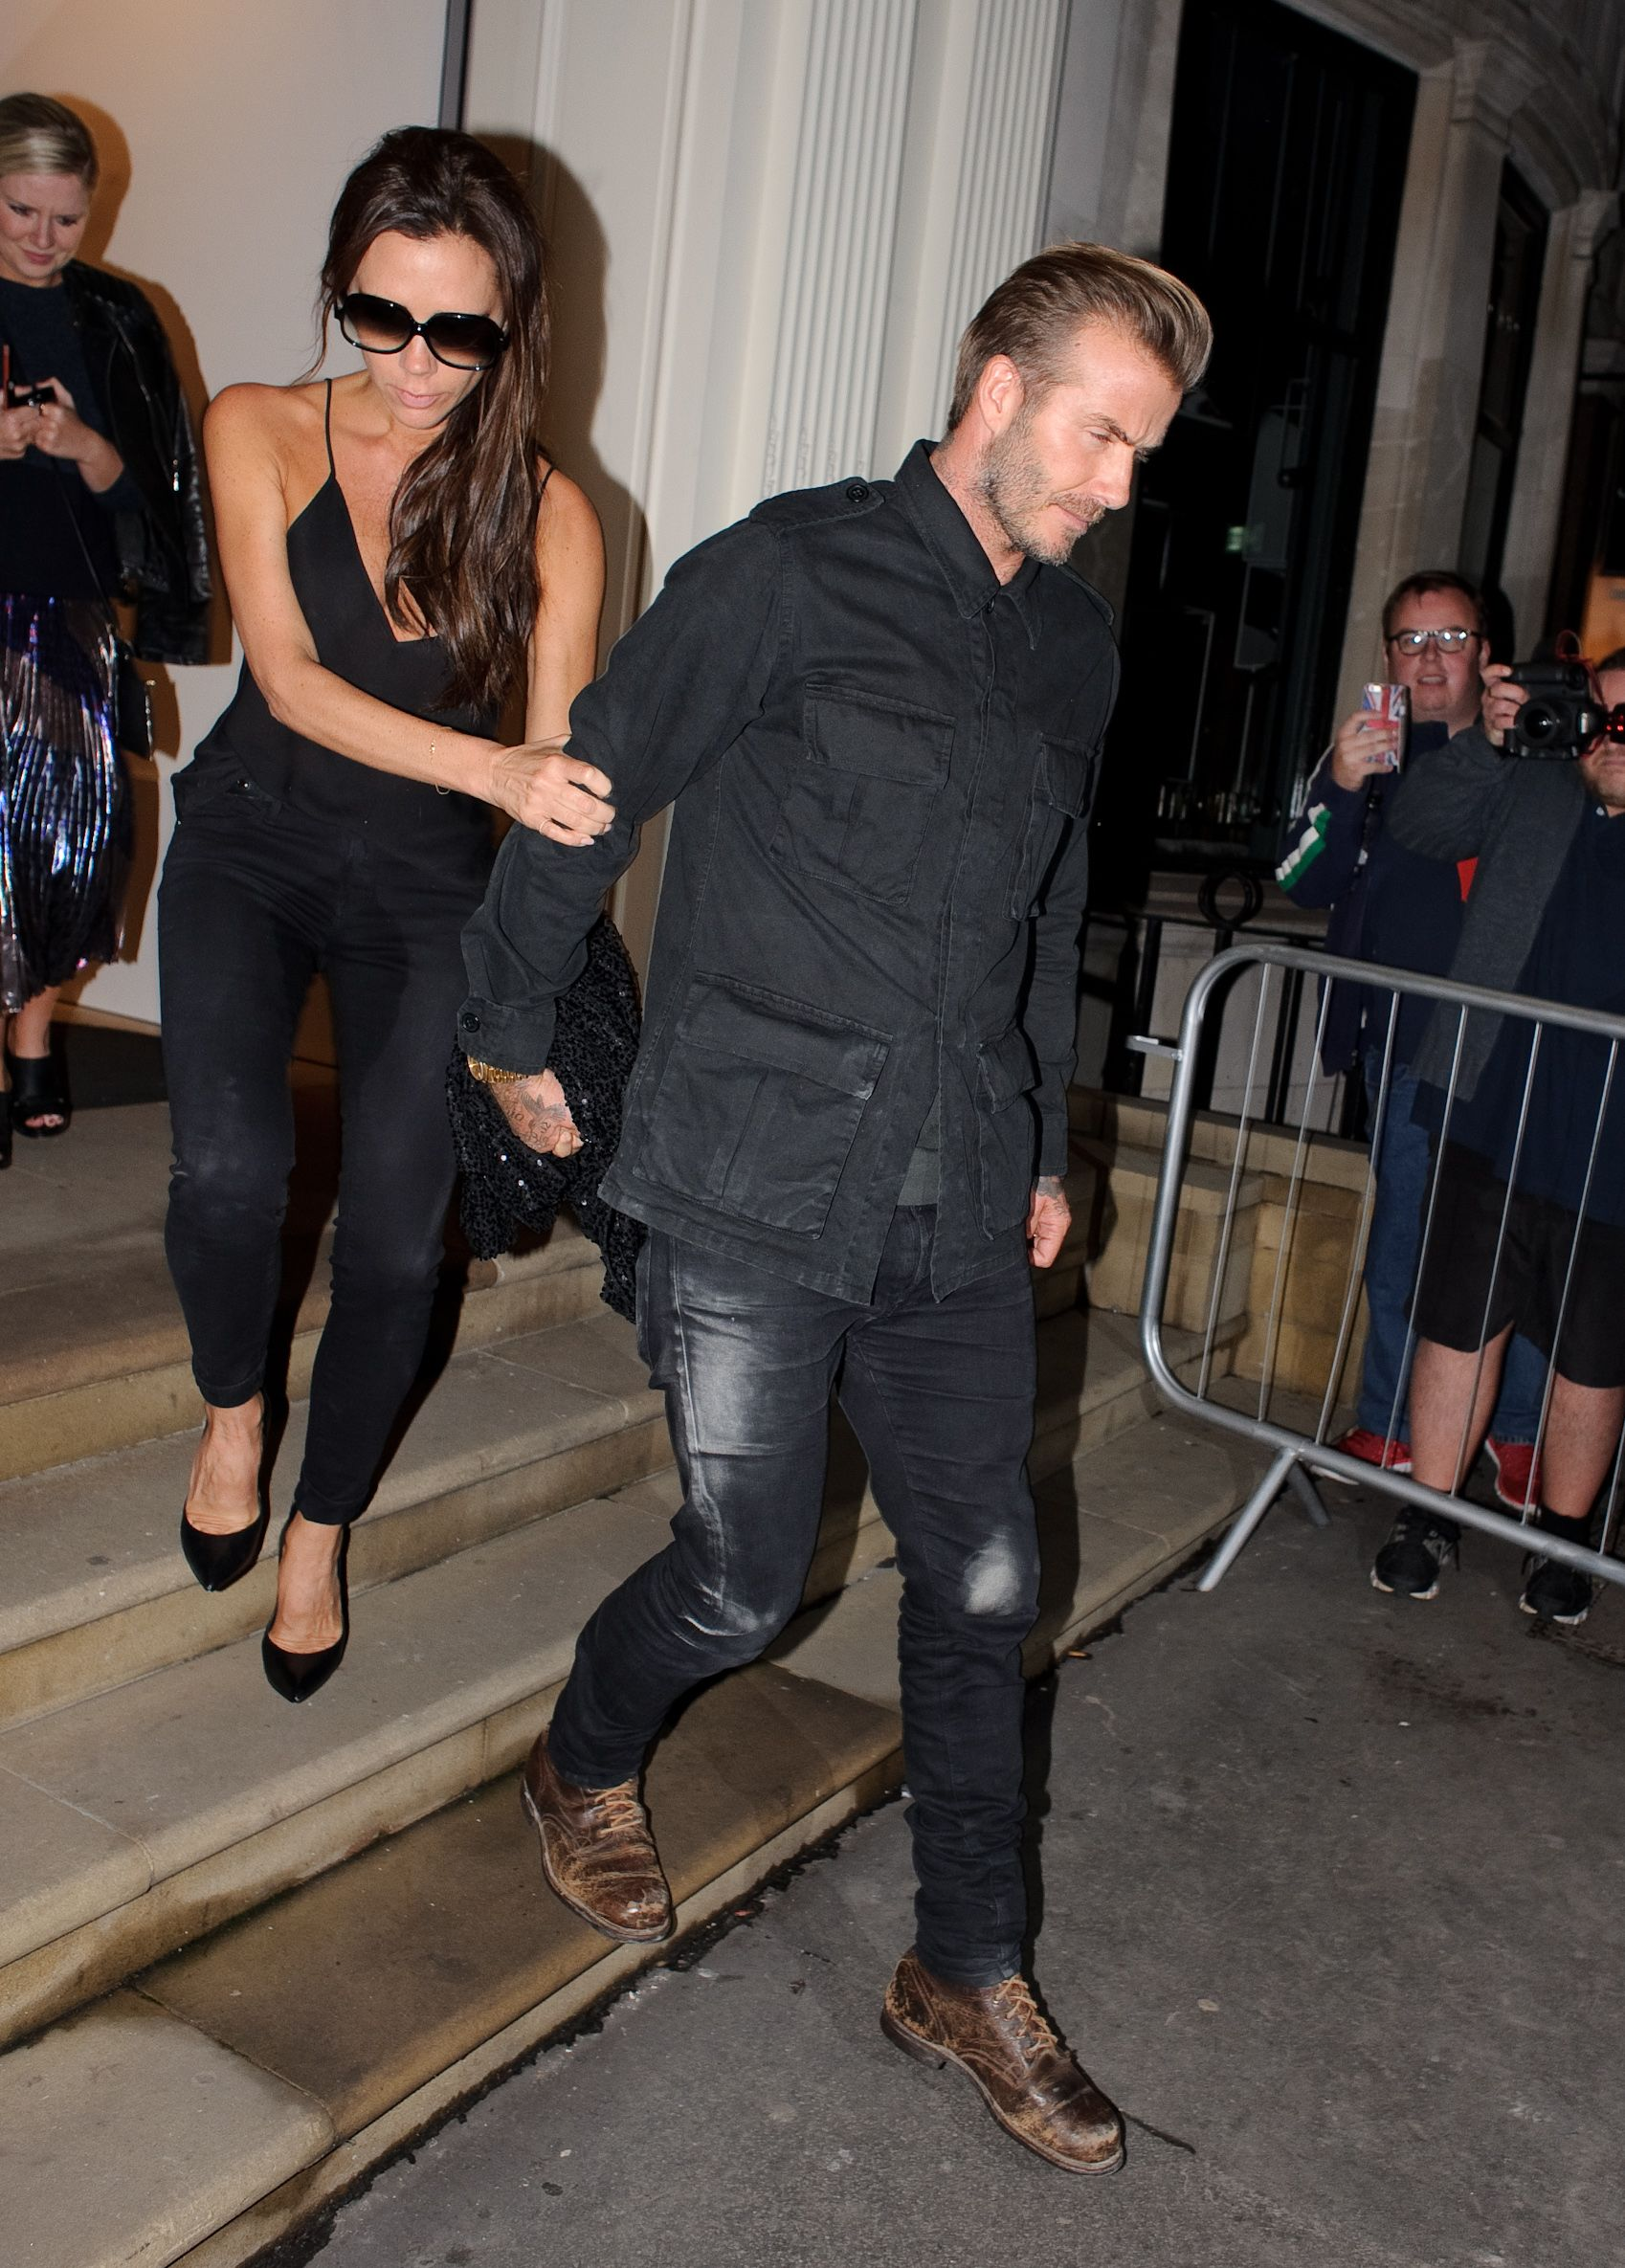 Victoria Beckham Wet Jeans (8 Photos)